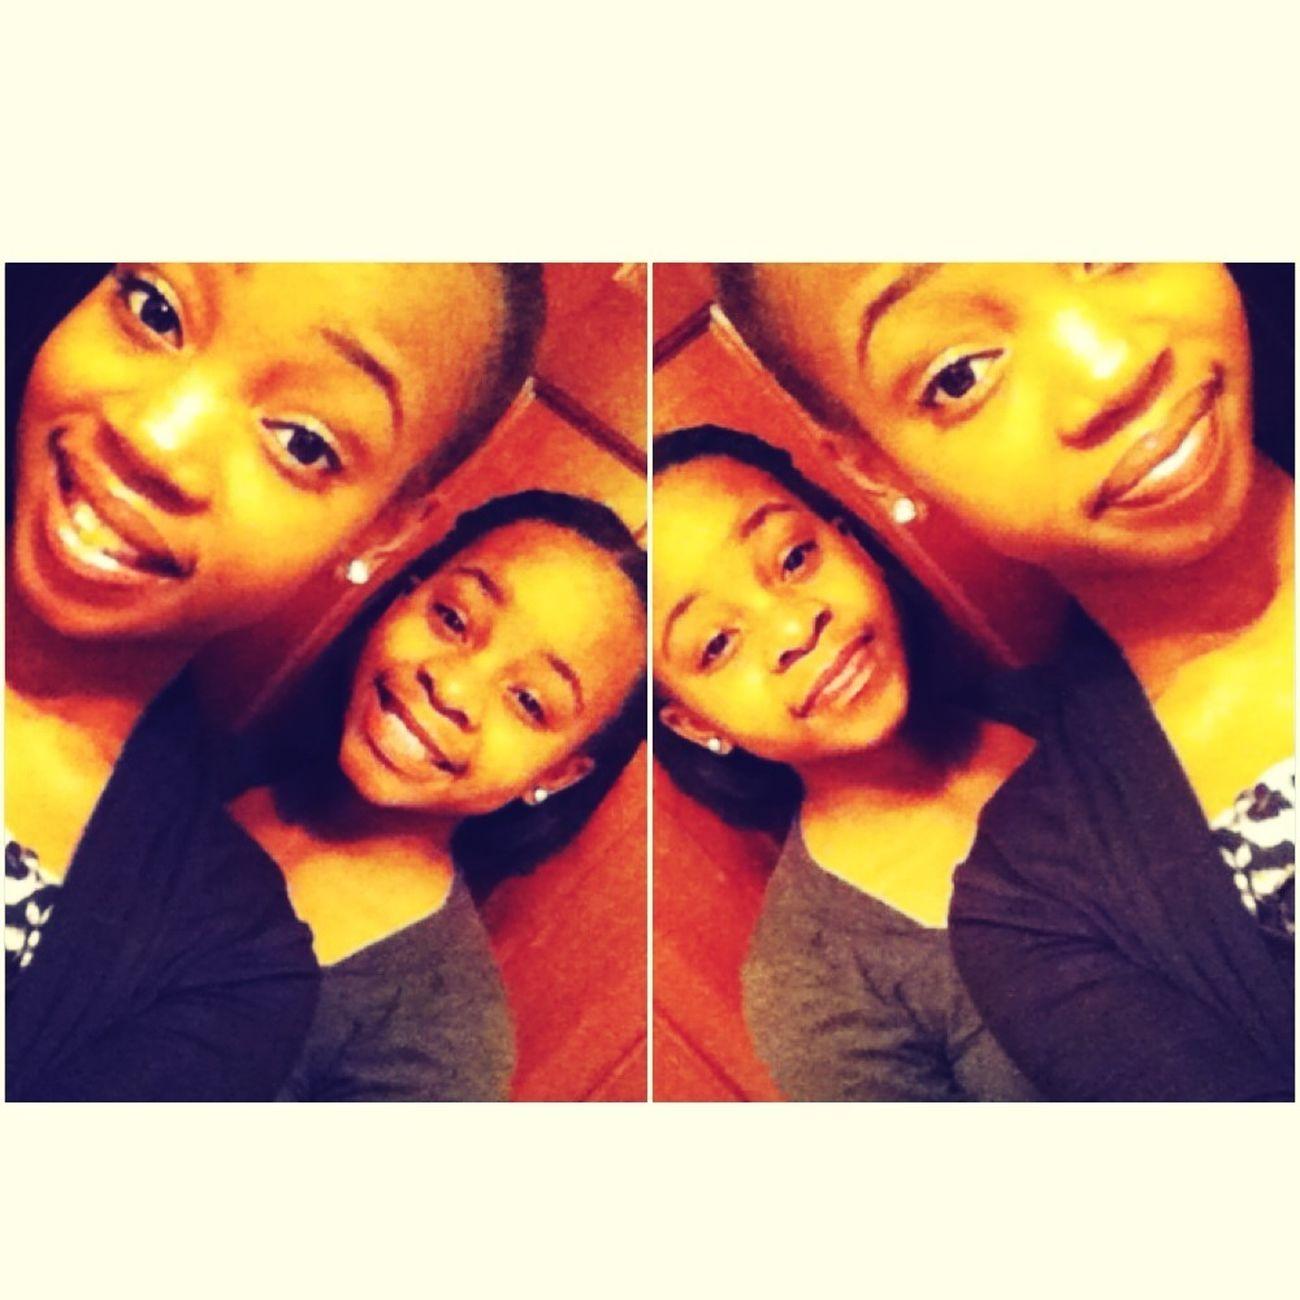 My Sister & I